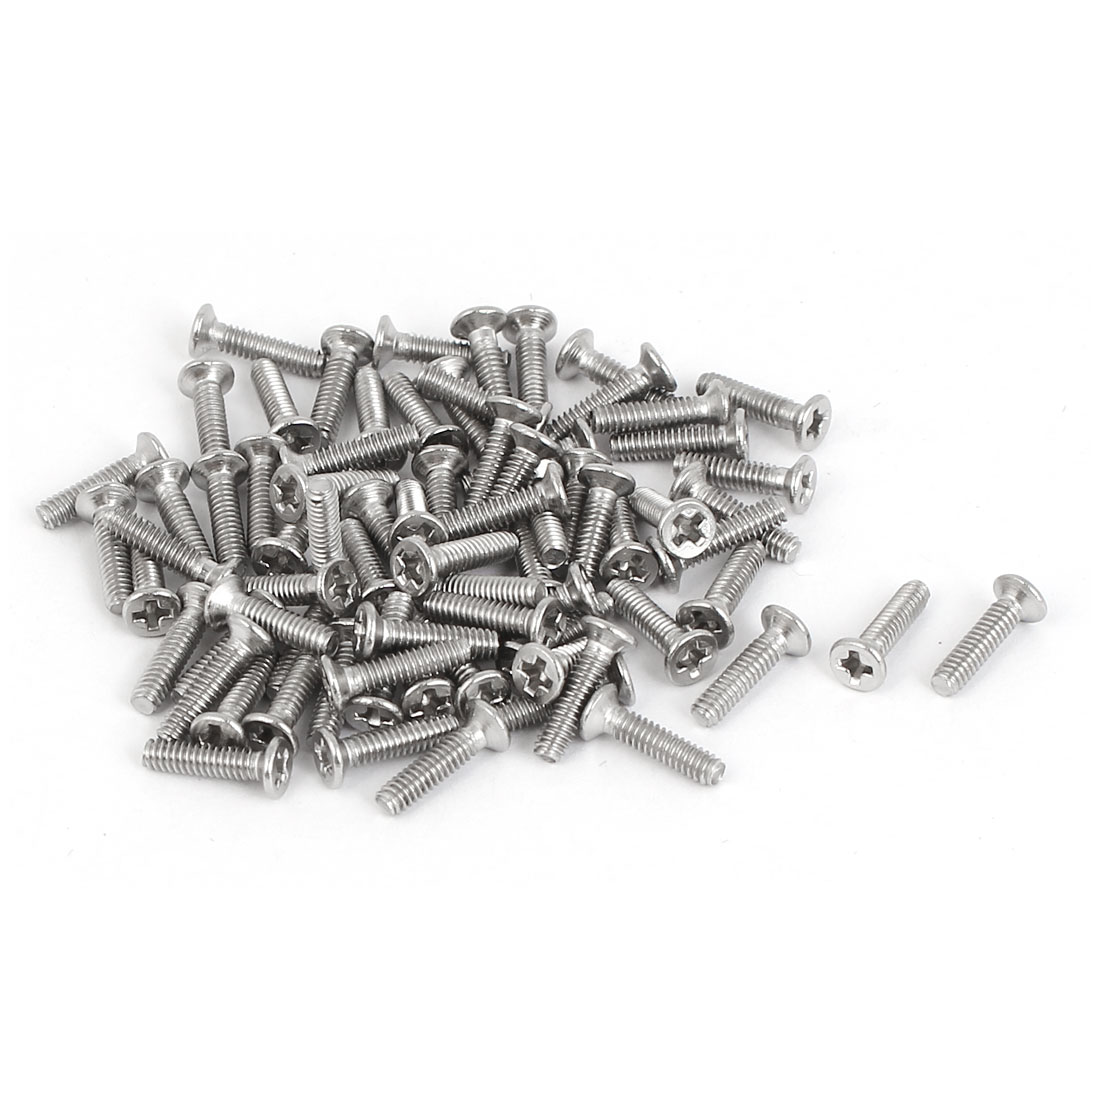 M2 x 8mm Fully Thread 316 Stainless Steel Phillips Drive Flat Head Screws 75 Pcs